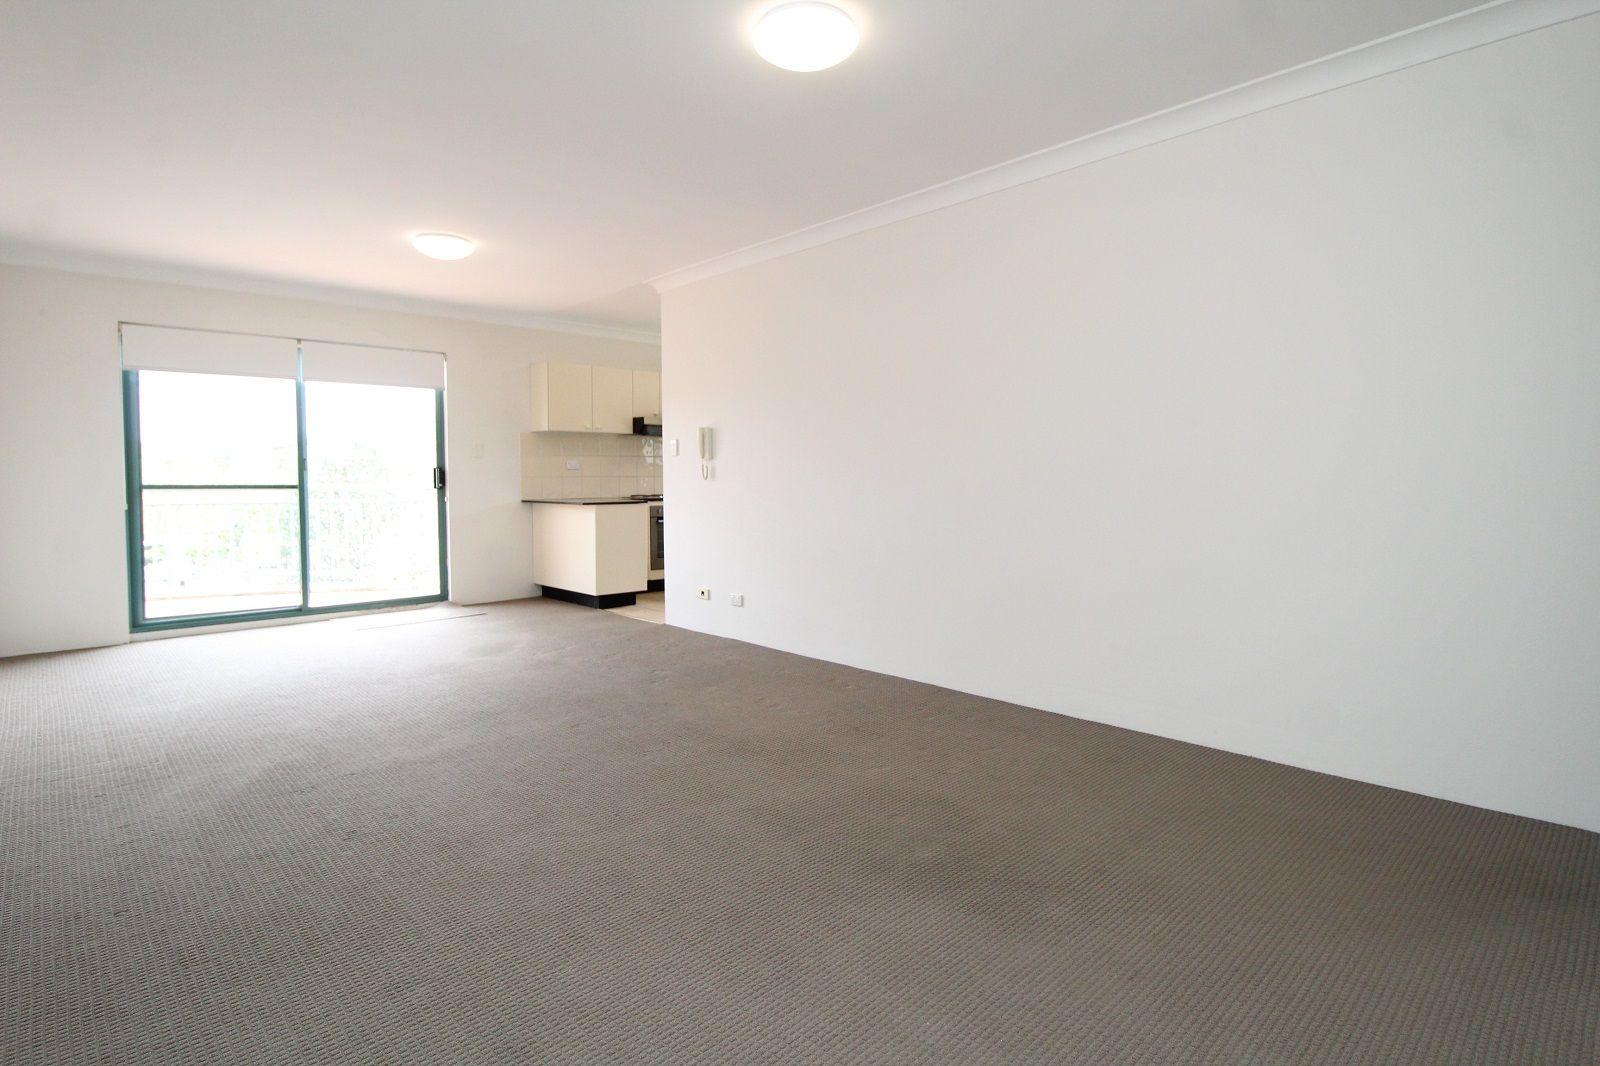 17/22-24 Sarsfield Circuit, Bexley North NSW 2207, Image 1